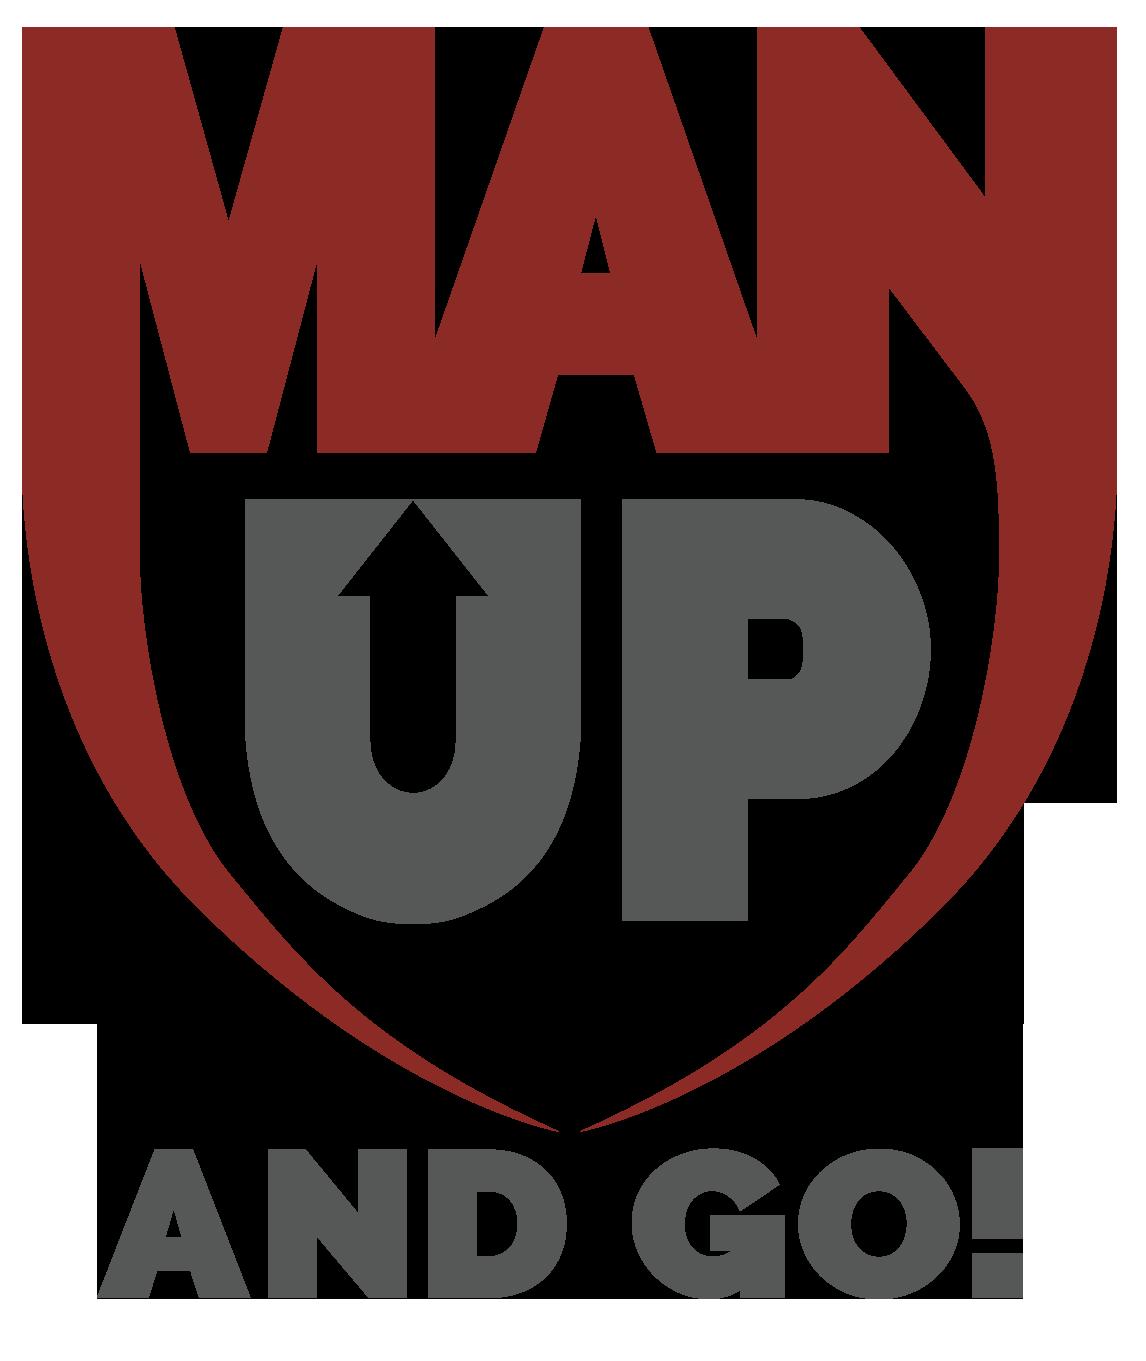 ManUp-AndGo-CleanLogo